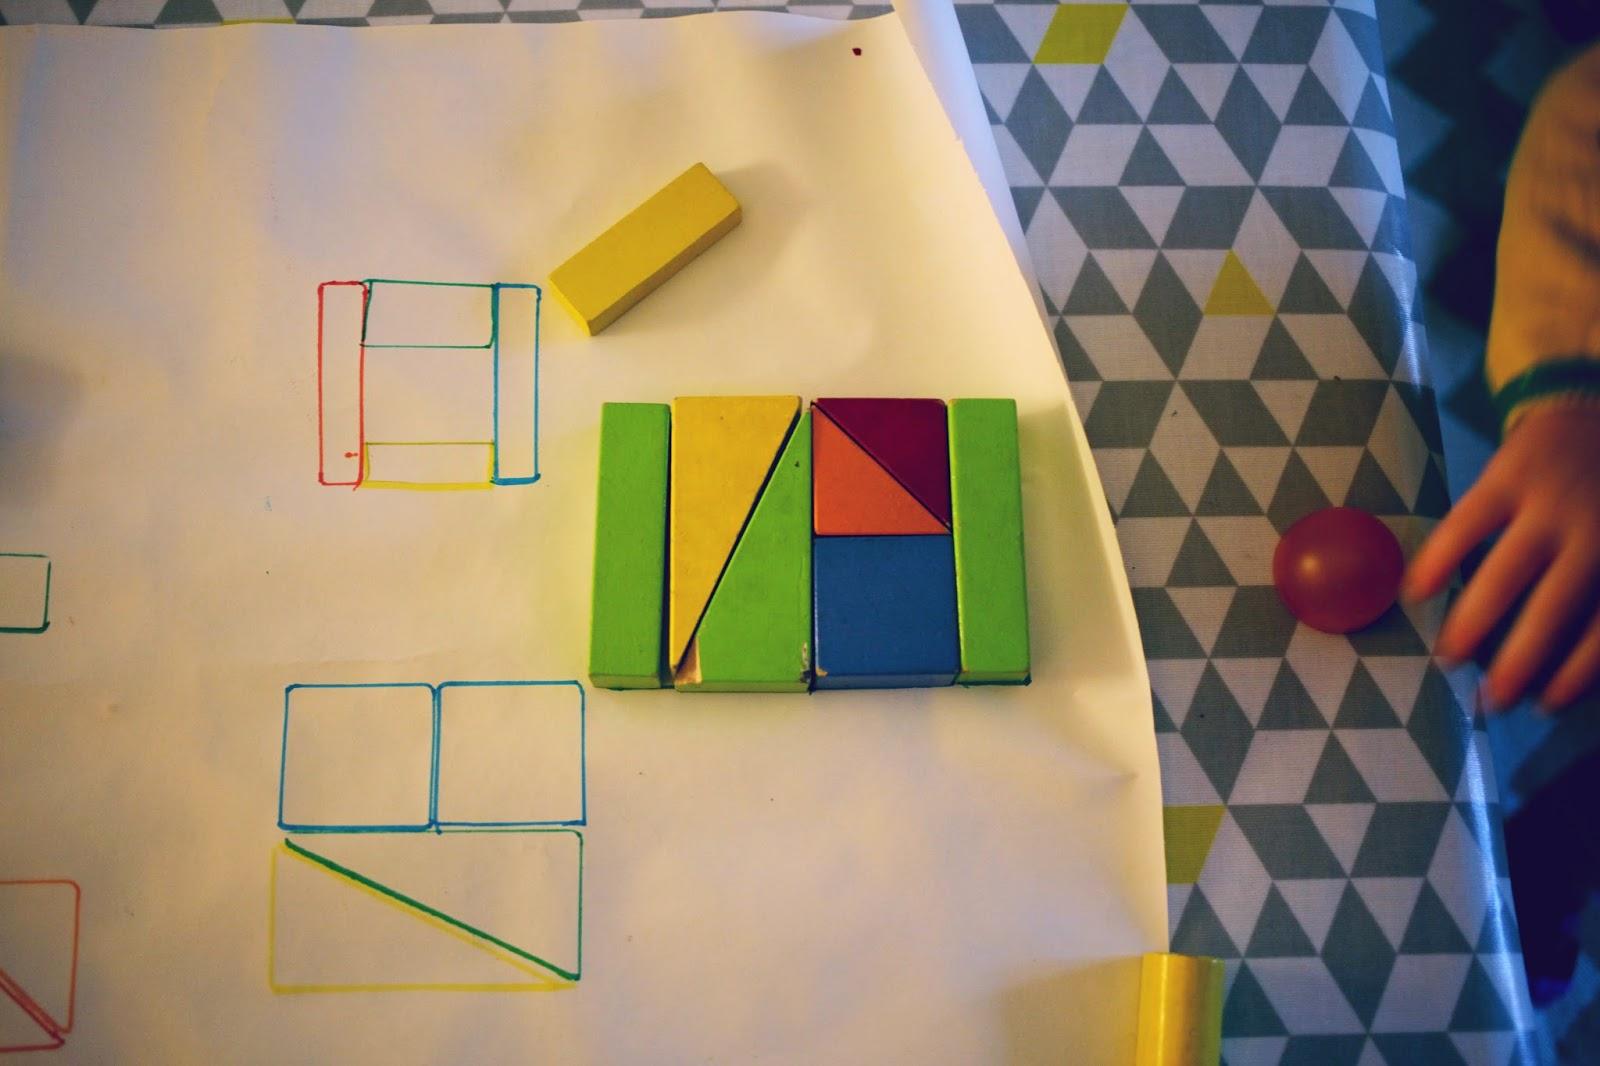 montessori at home matching patterns and blocks